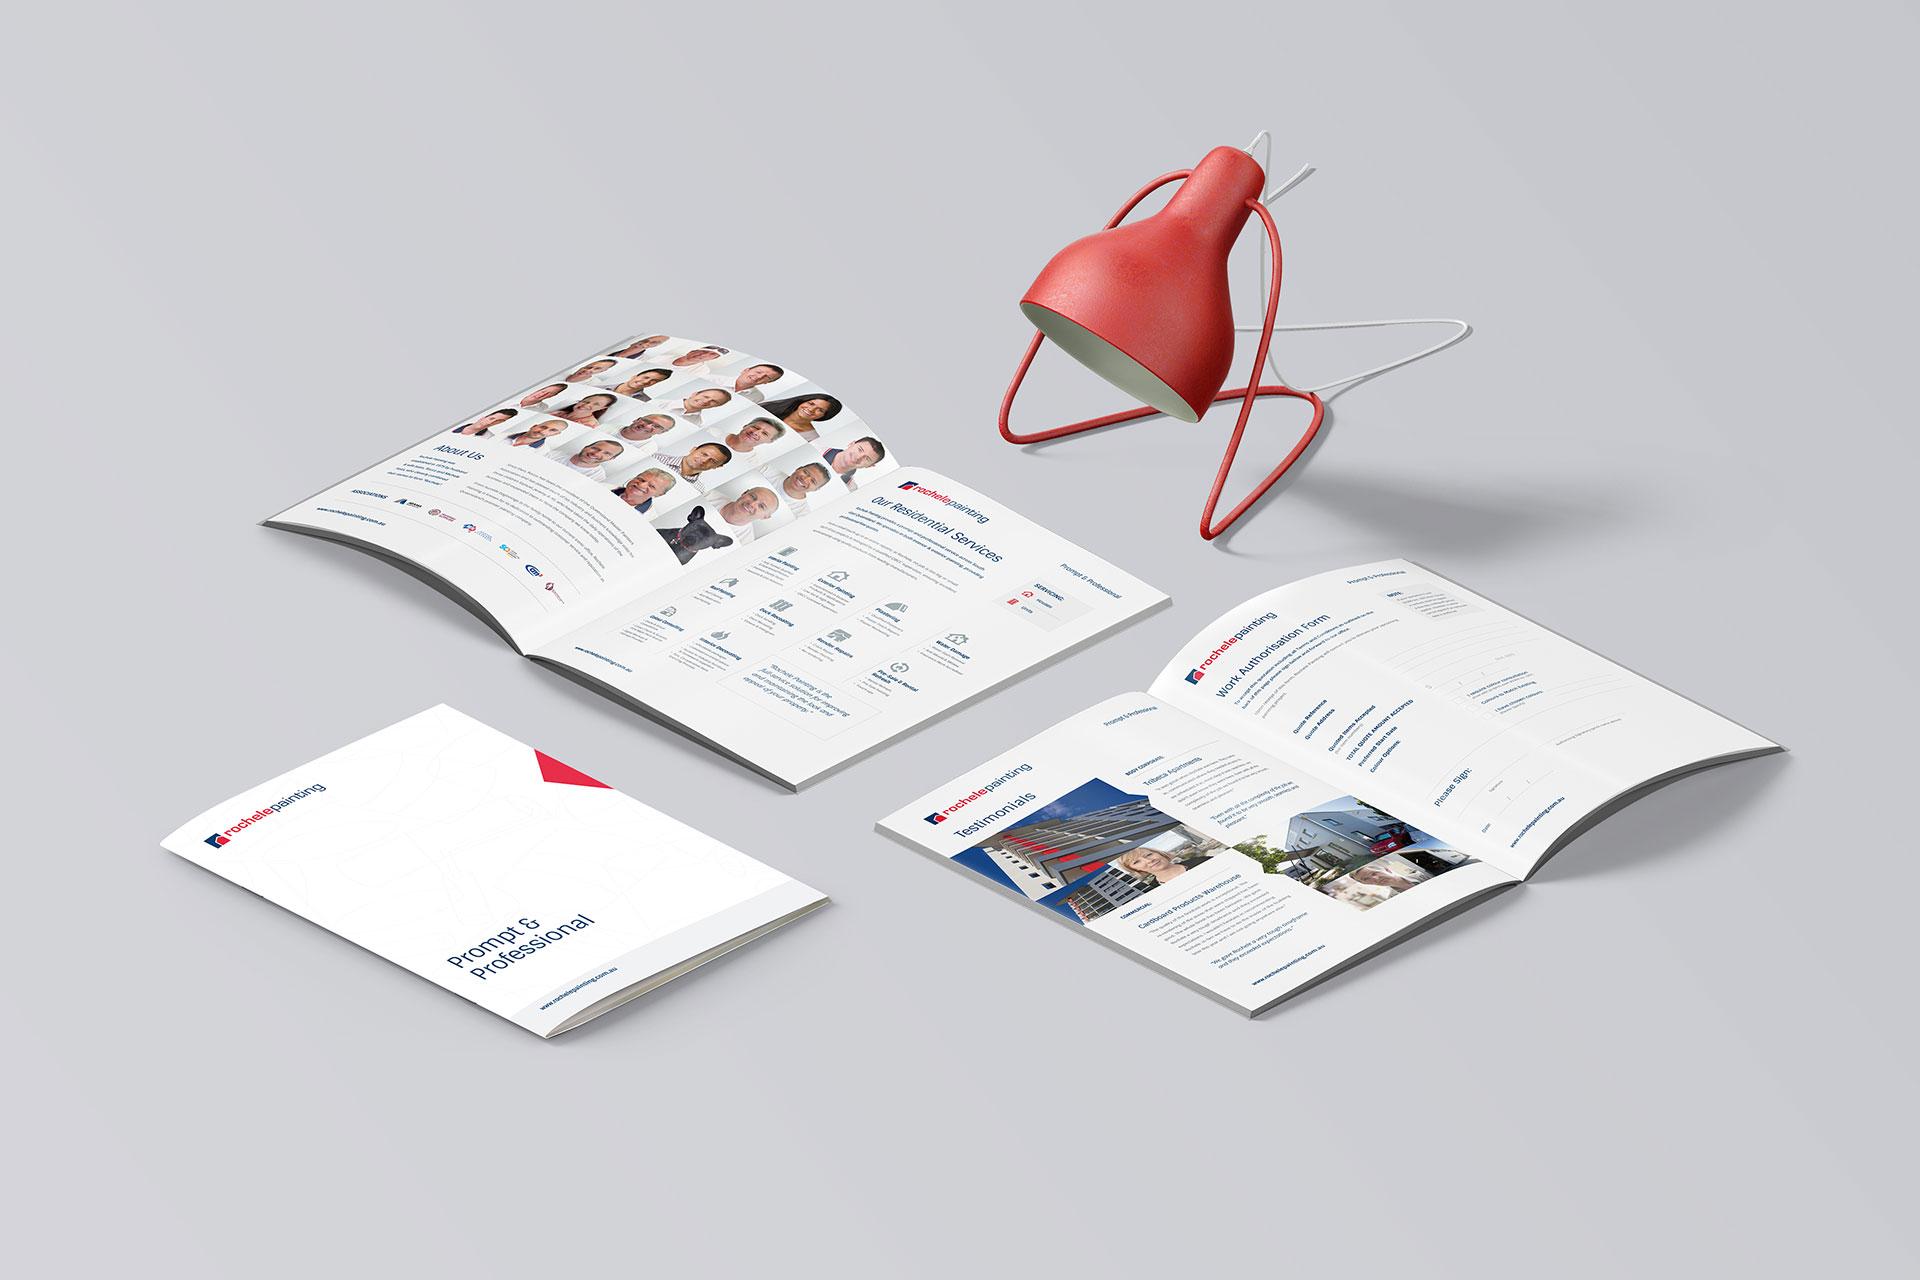 Rochele-Painting-Document-Design